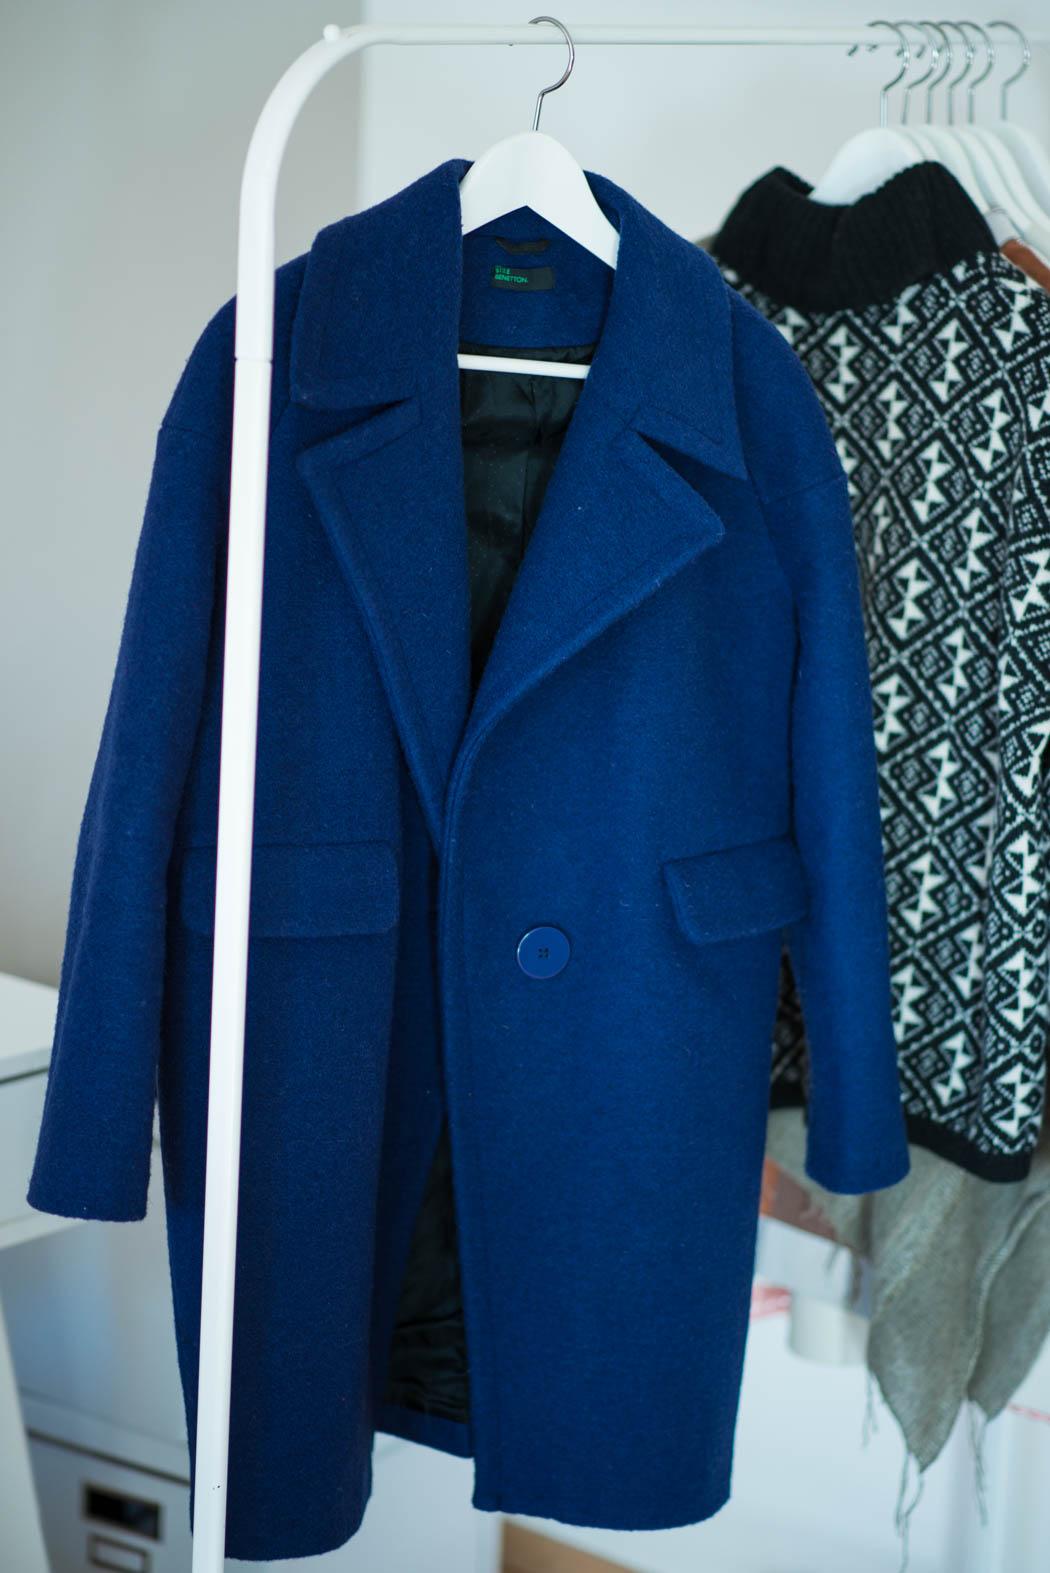 Shoppinghaul-Lindarella-Fashionblogger-München-Deutschland-Fashionblog-2